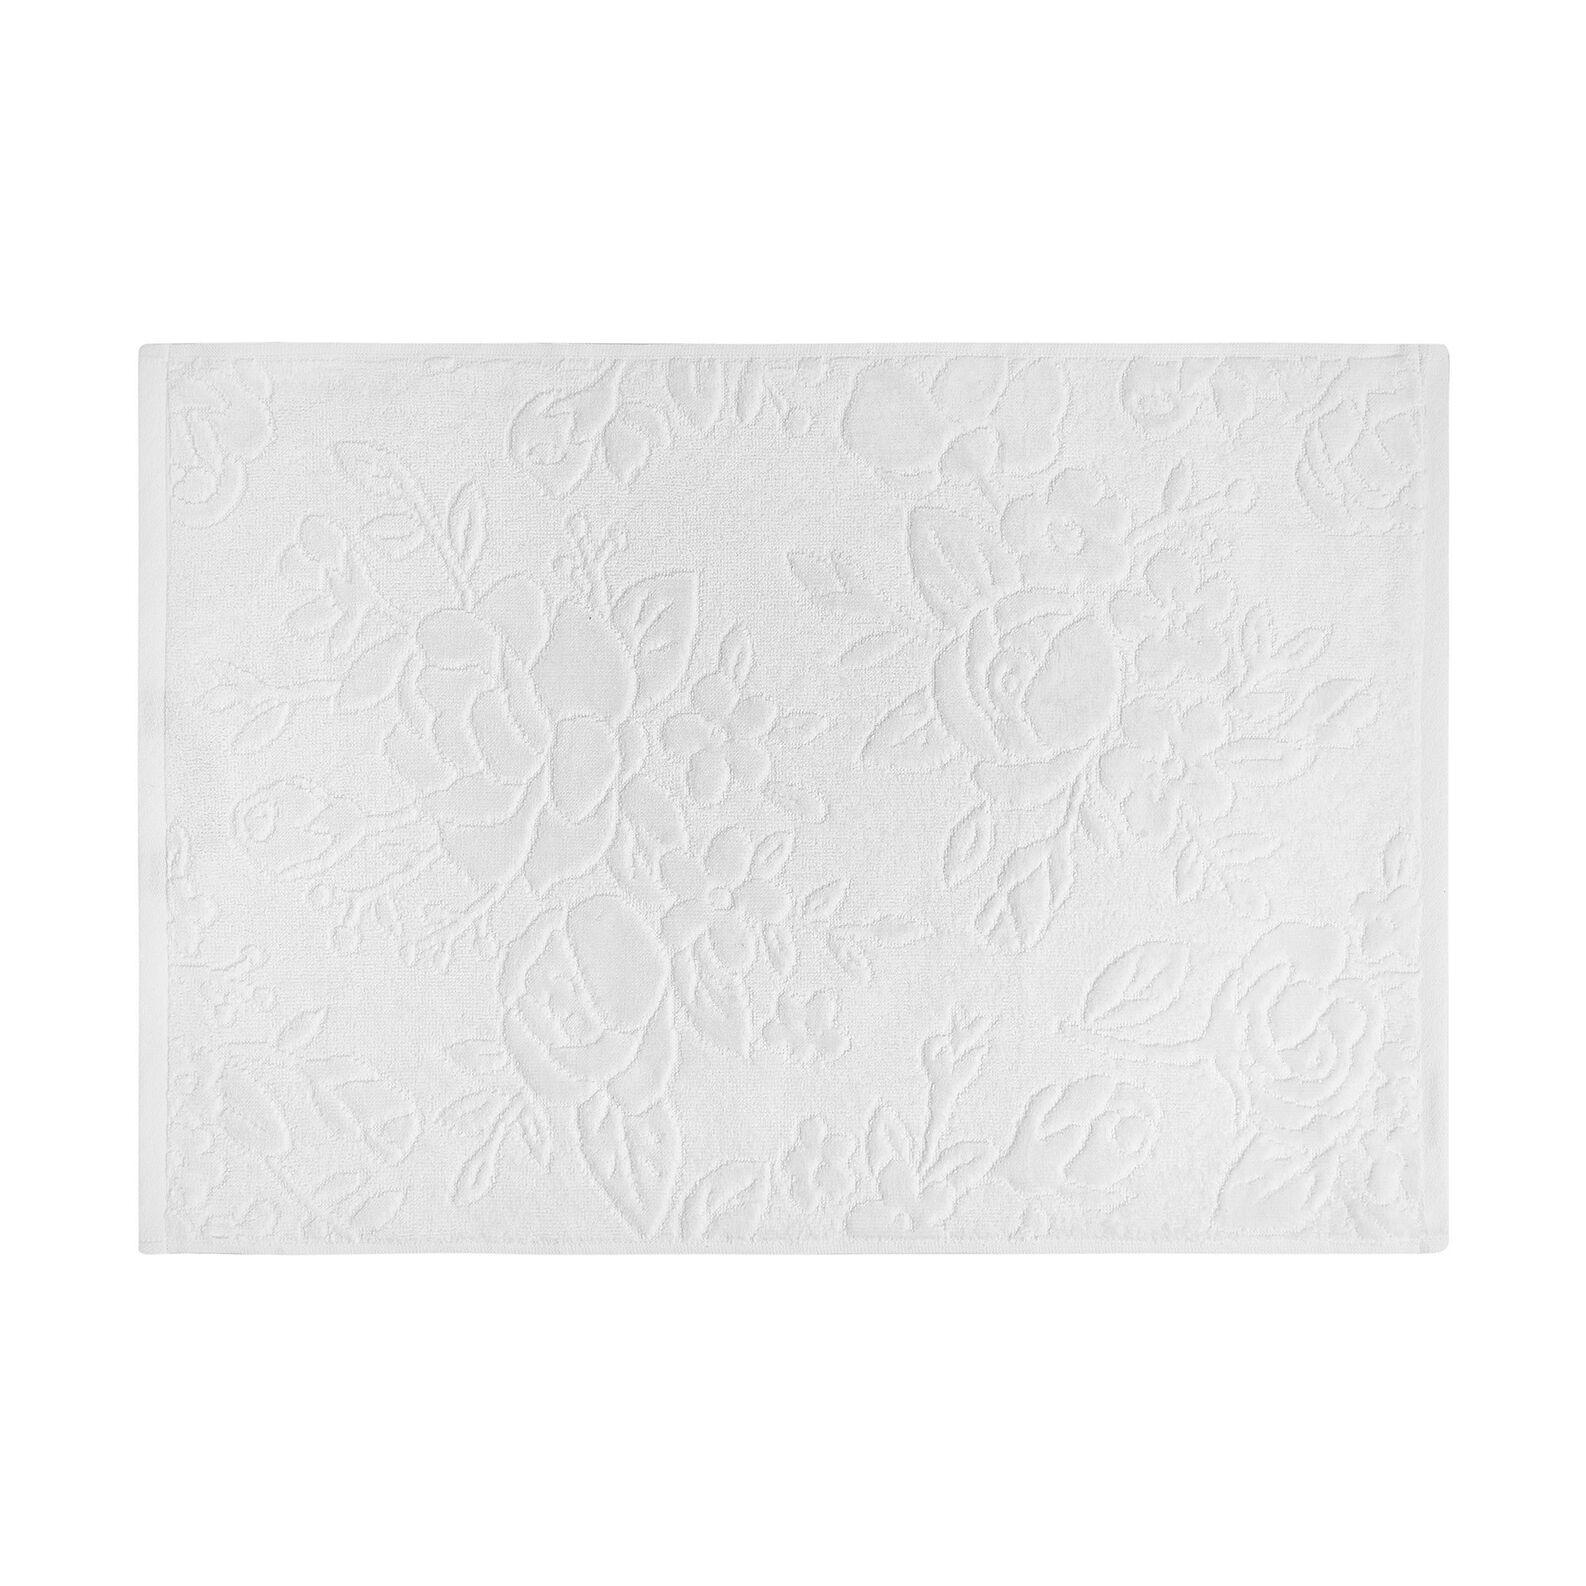 100% cotton towel with floral design